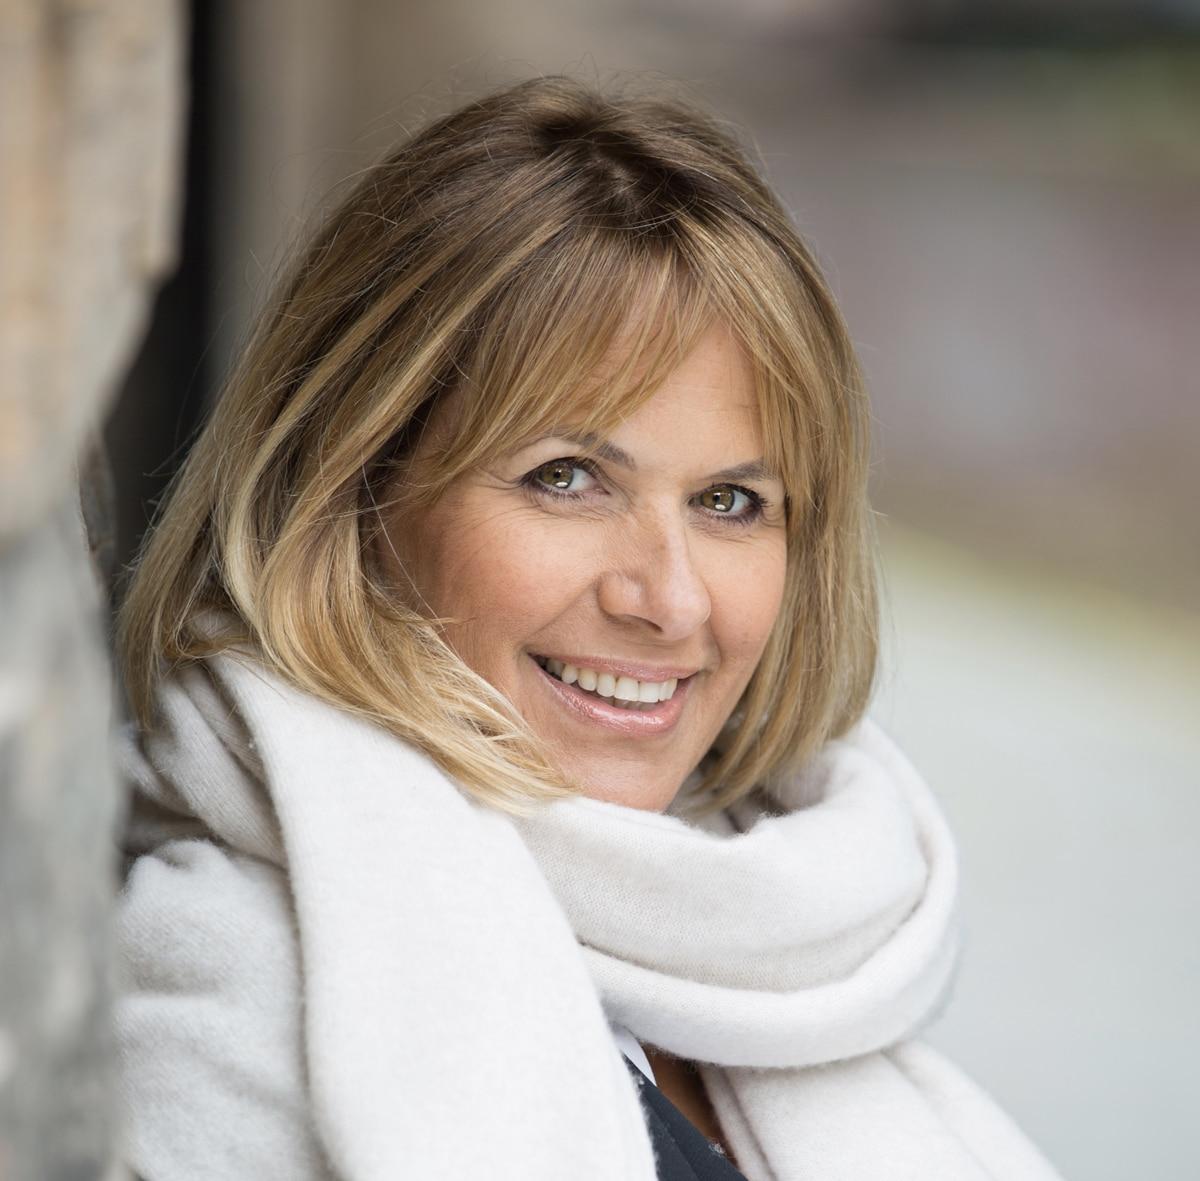 Carol Smillie Speaker conference host at Great British Speakers